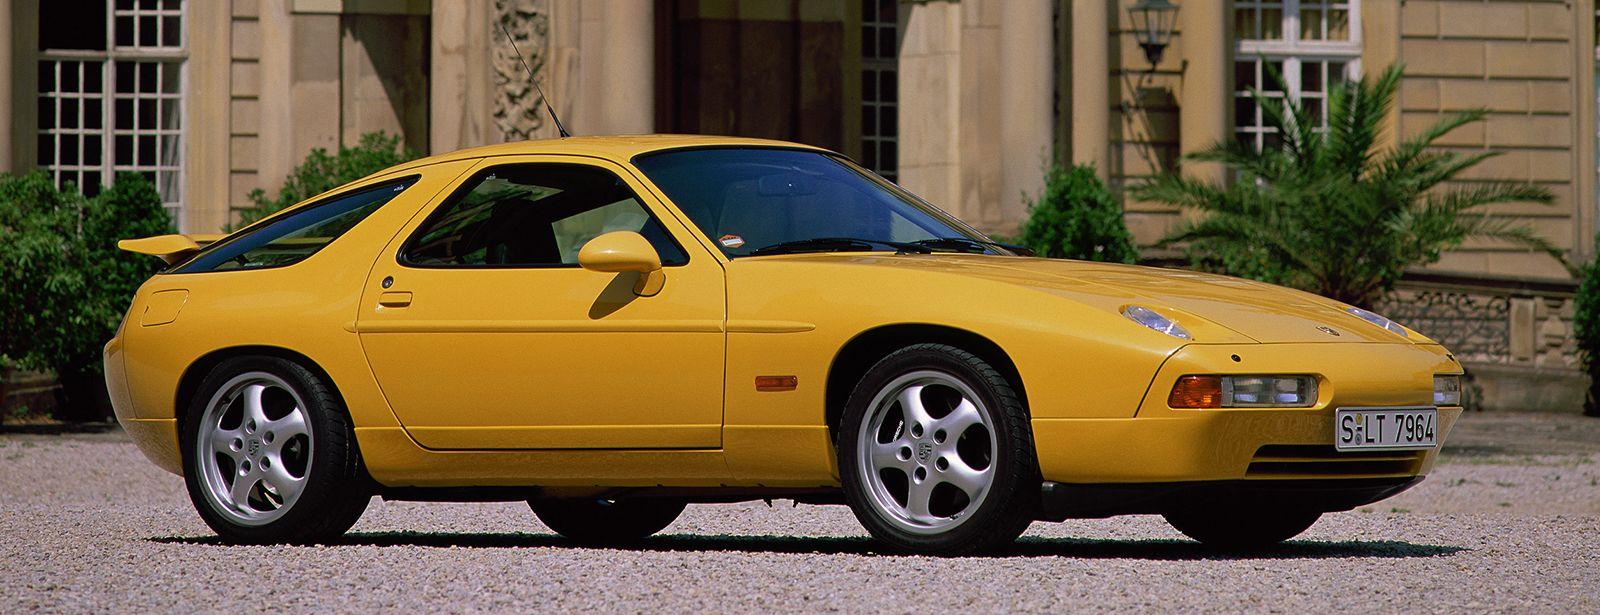 Porsche 928 GTS 1989-1995